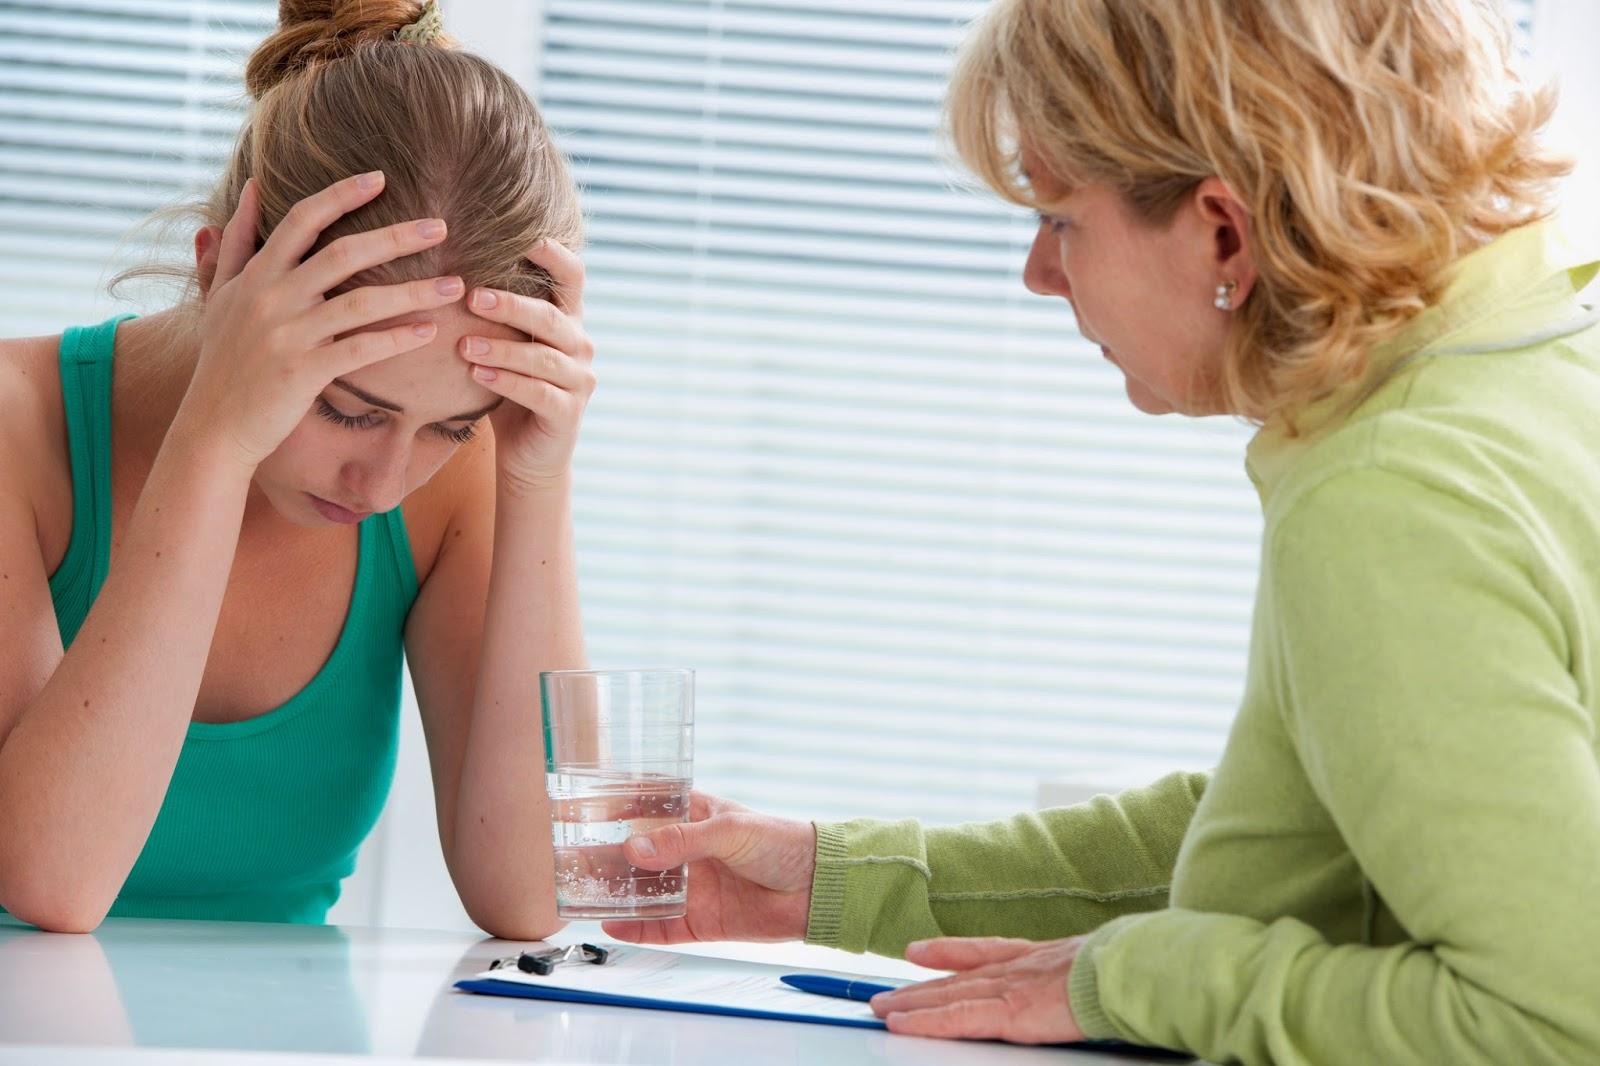 Необходима ли помощь психолога при неврастении?